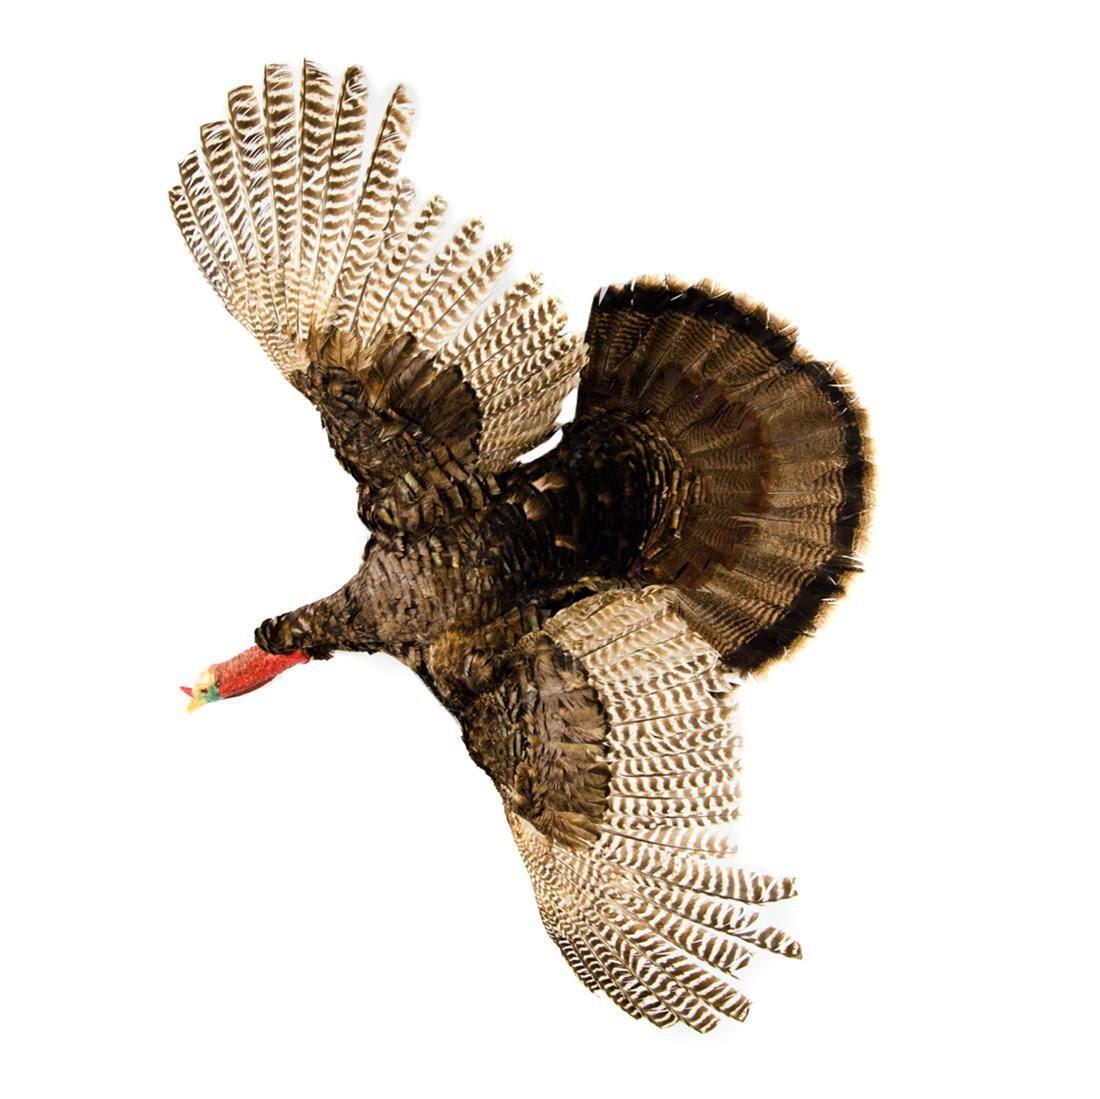 Eastern Wild Turkey Life-Size Taxidermy Mount